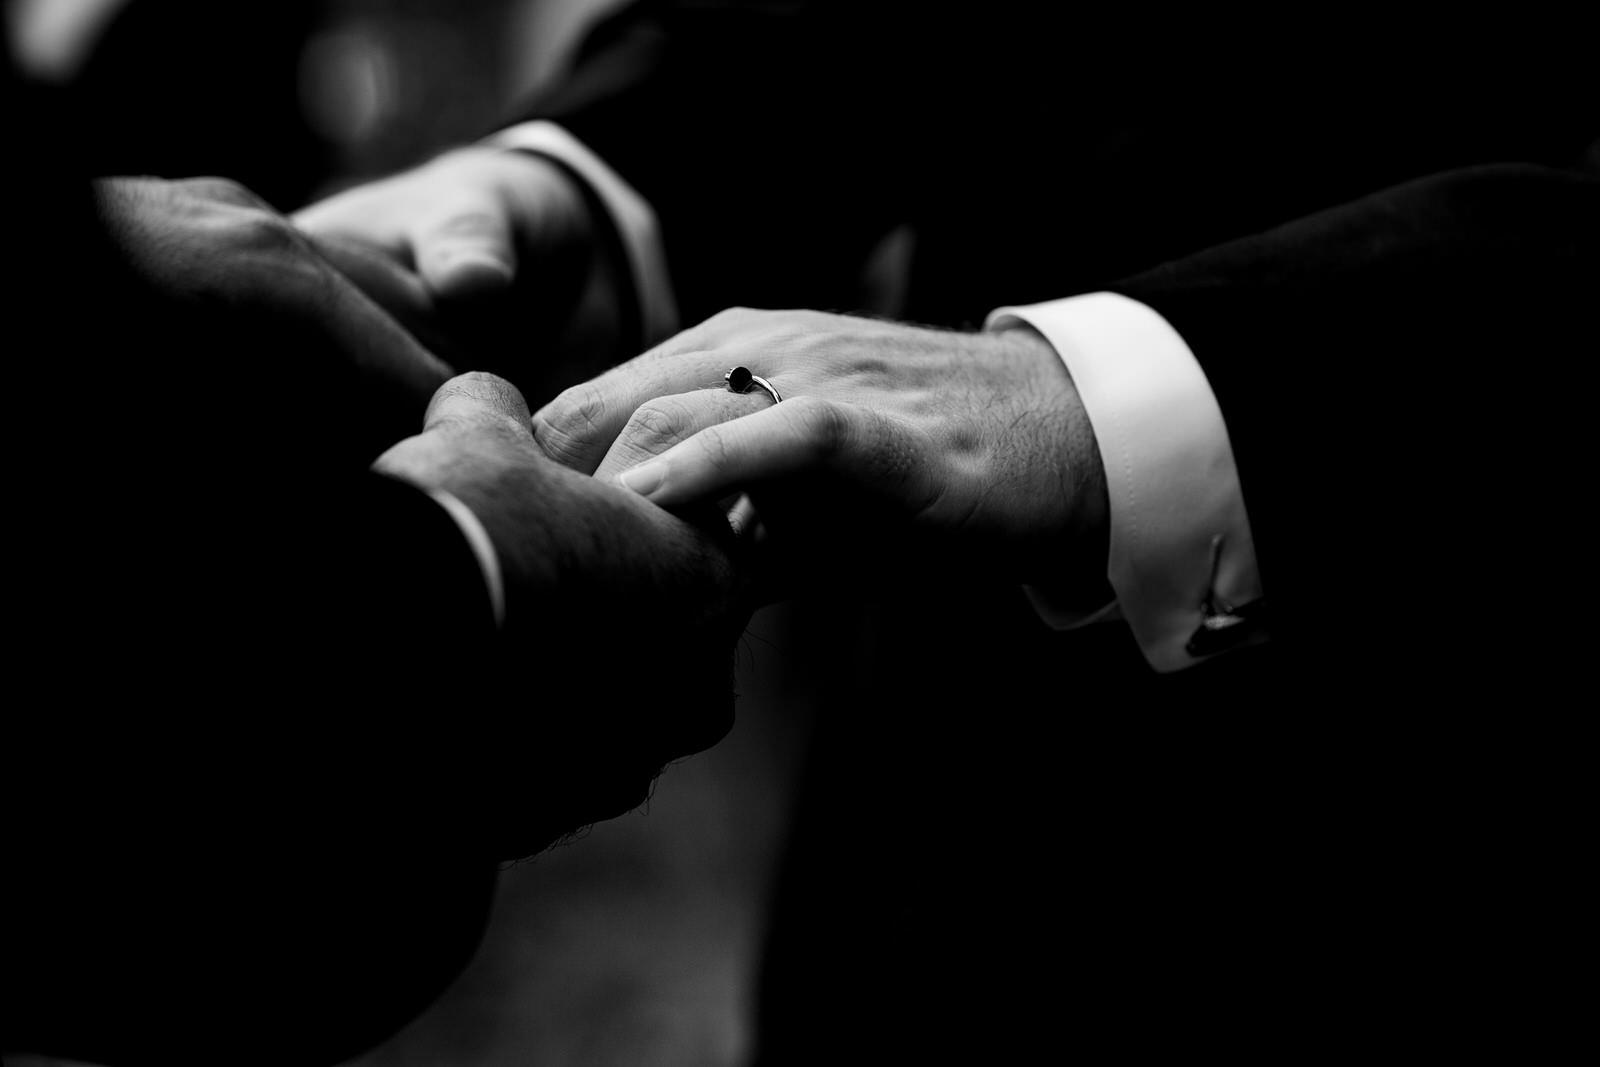 vizcaya_elopement_intimate_wedding_ceremony-36.jpg